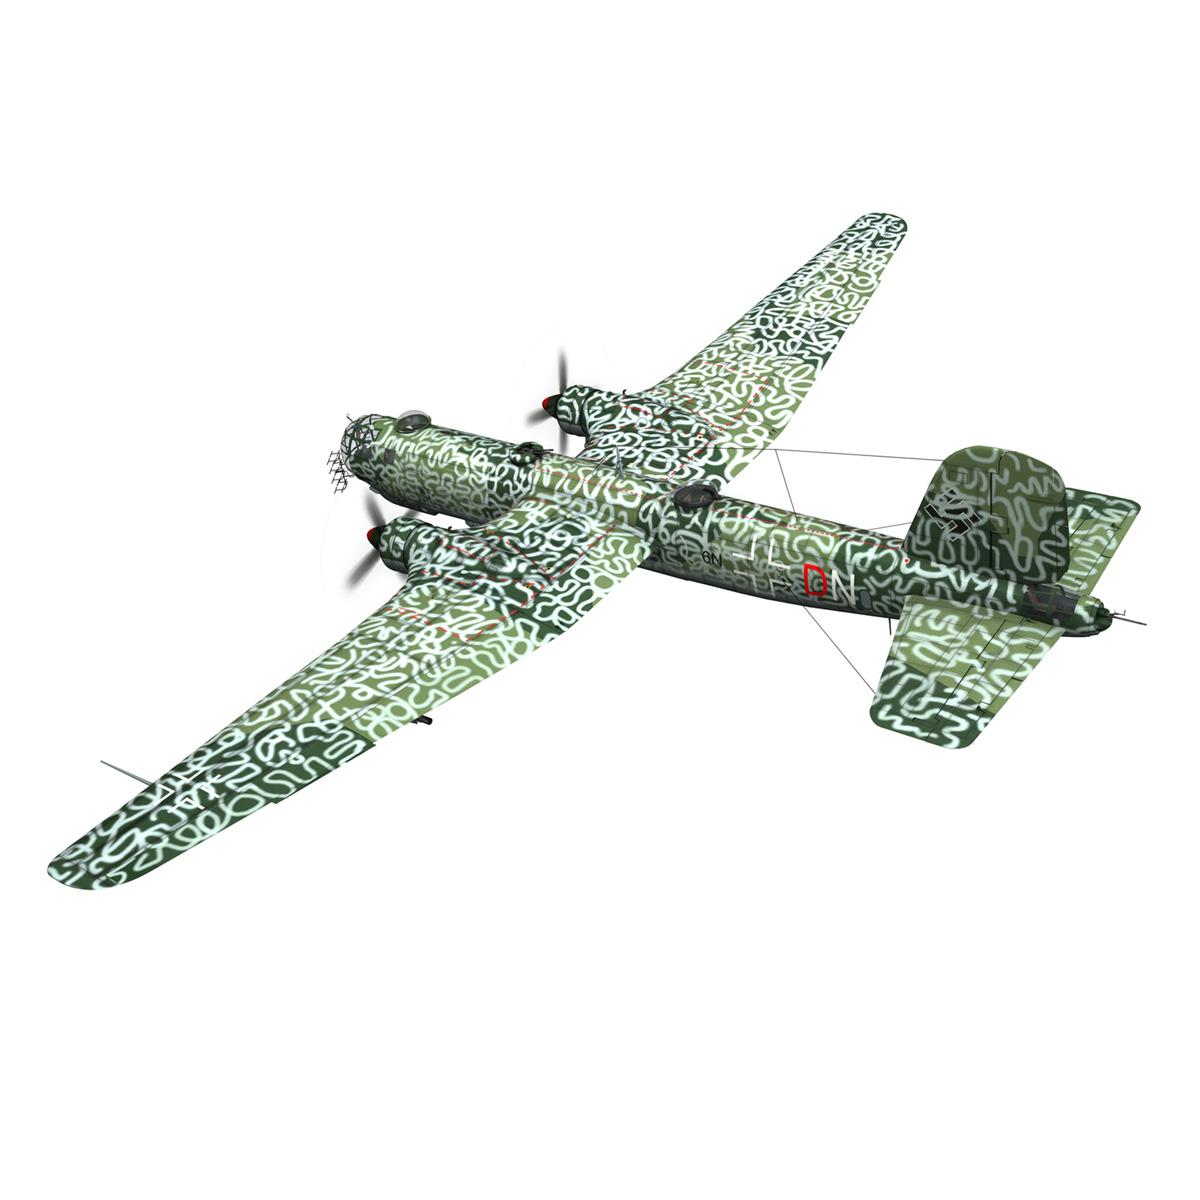 heinkel he-177 a-5 – greif – 6ndn 3d model 3ds fbx c4d lwo obj 201591